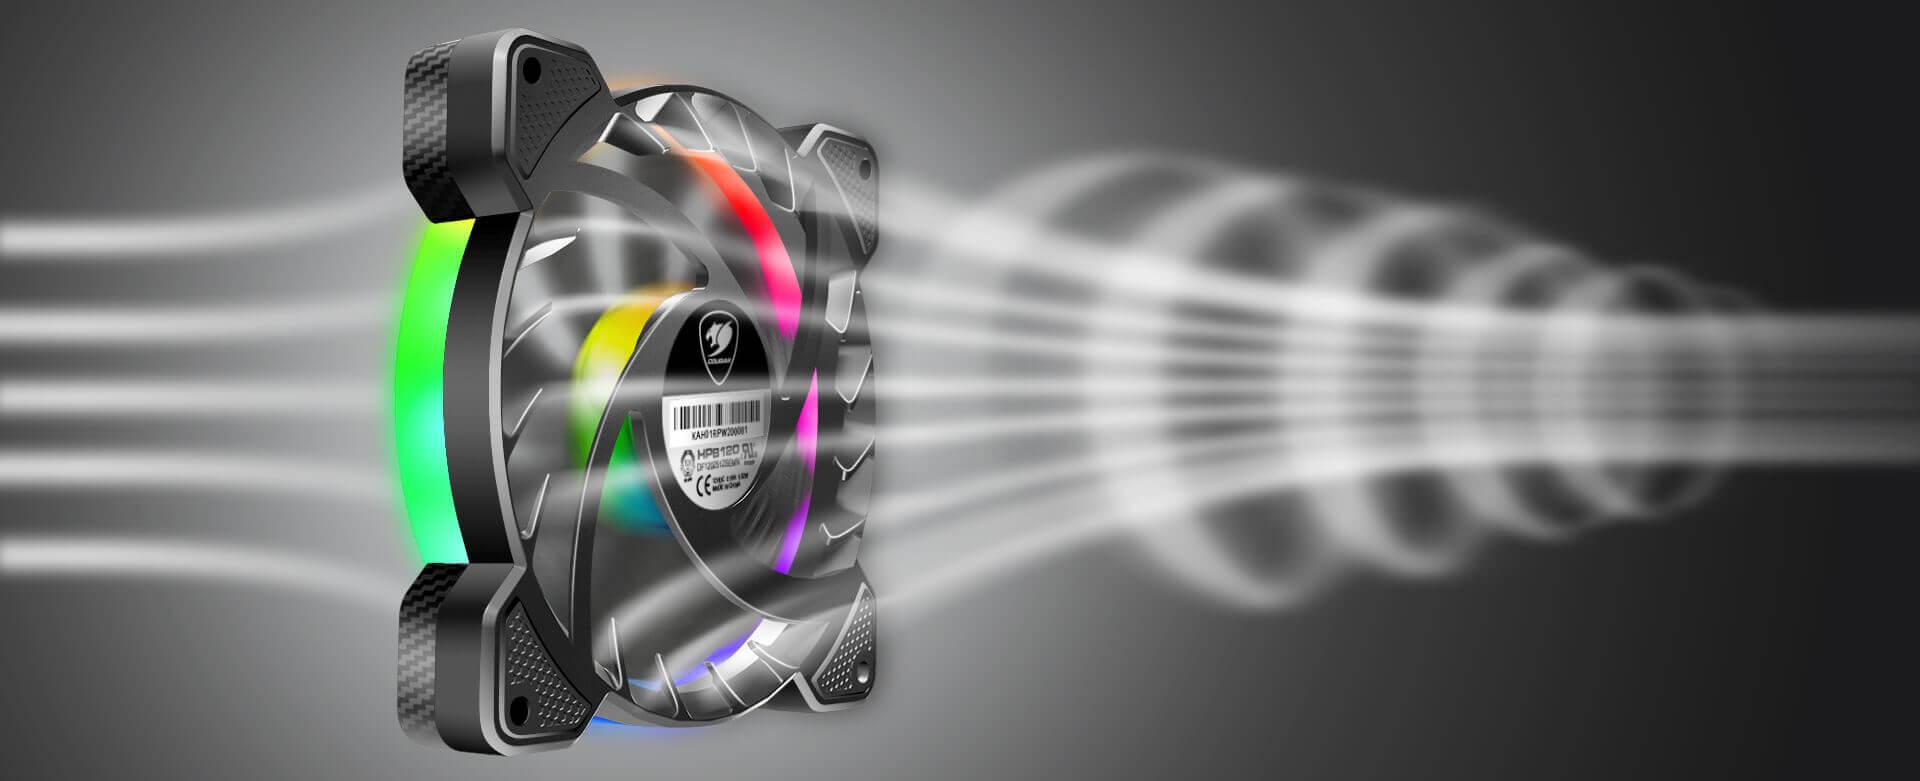 Cougar VORTEX RGB SPB 120 PWM HDB Cooling Kit Fans - 3 pack 13